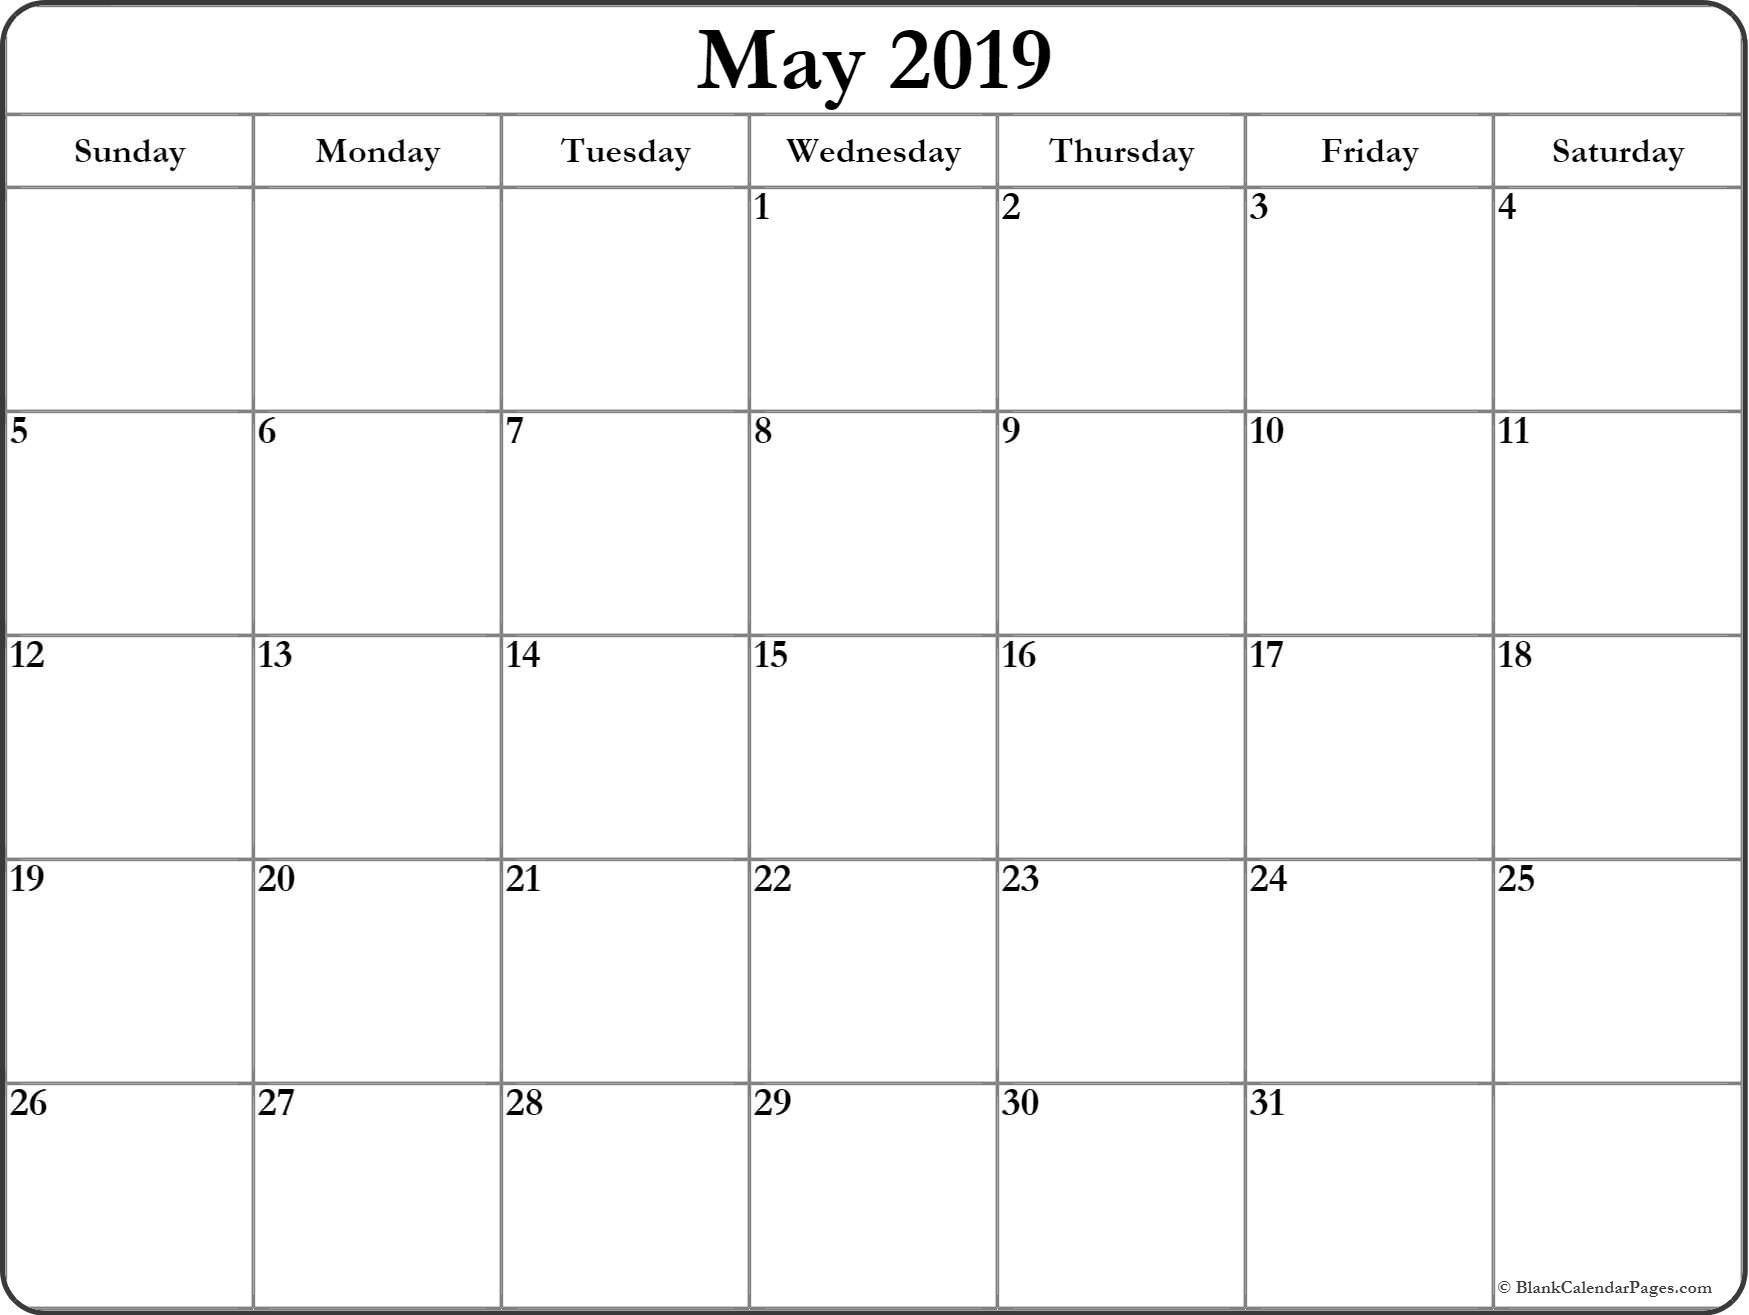 2019 Calendar Singapore Download Más Caliente 2019 May Calendar May May2019 Maycalendar2019 Of 2019 Calendar Singapore Download Actual March 2019 Calendar Wallpaper Desktop March Calendar Calenda2019